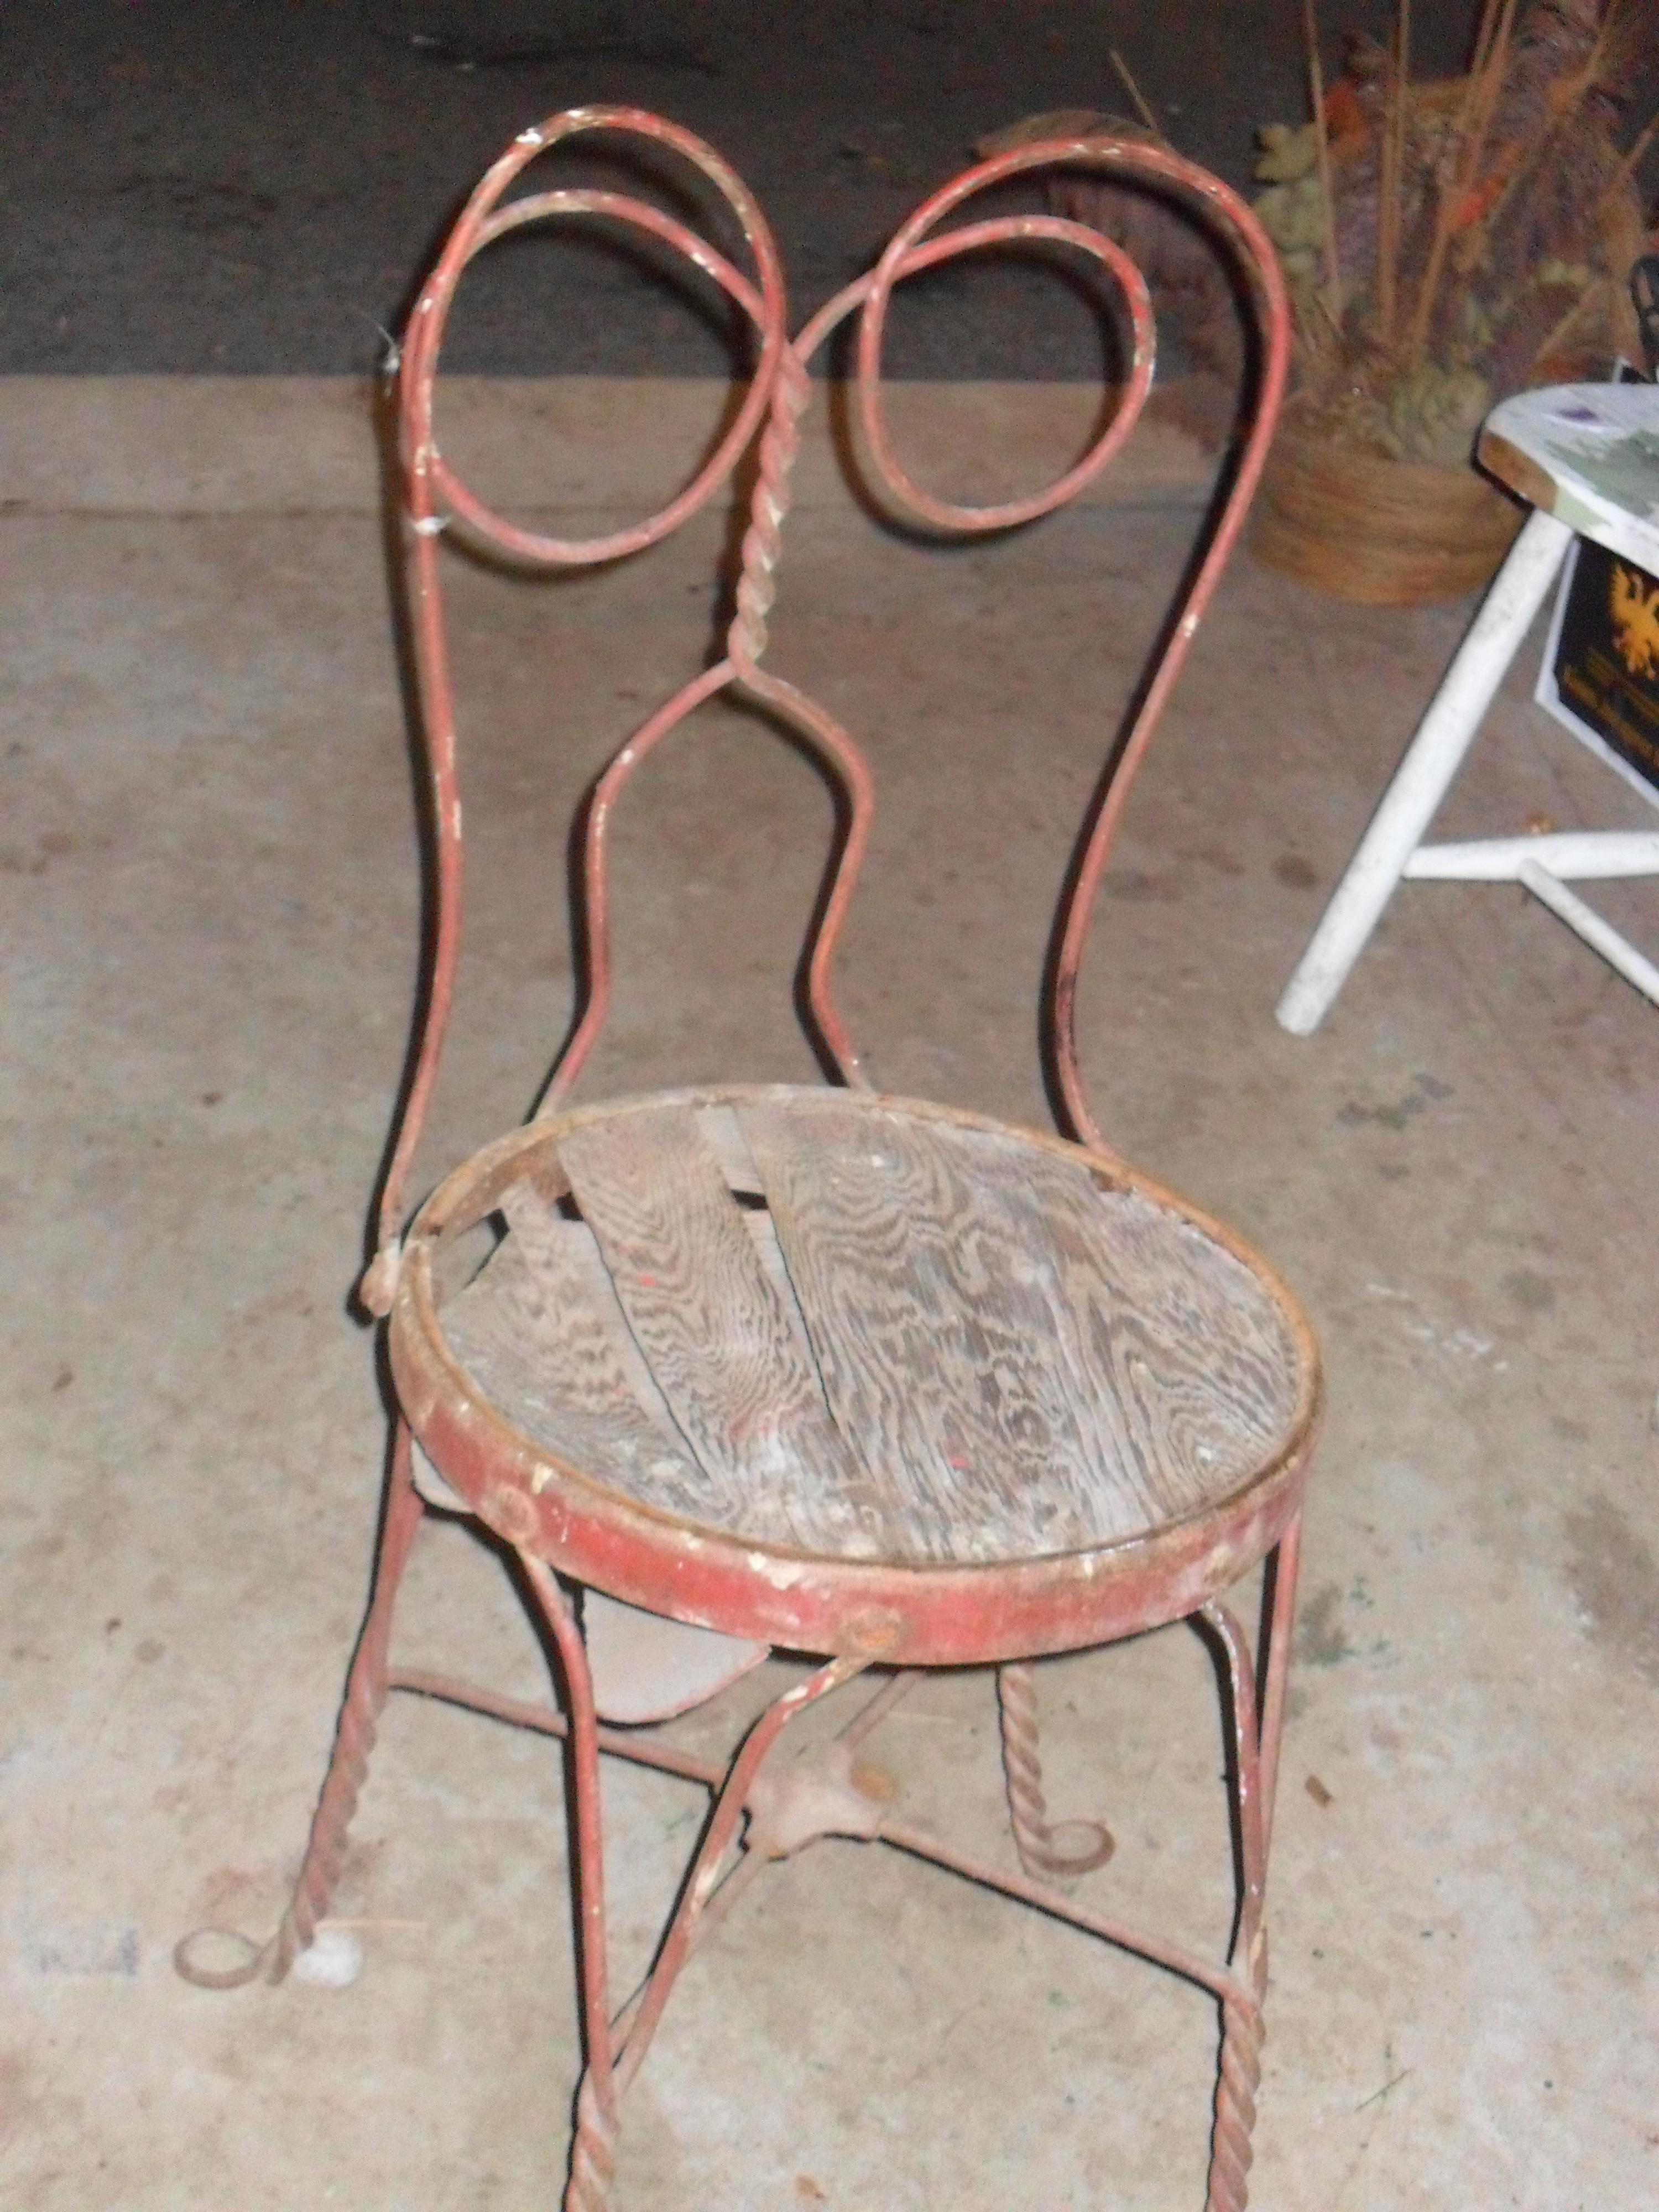 Chair or Bulletin Board?